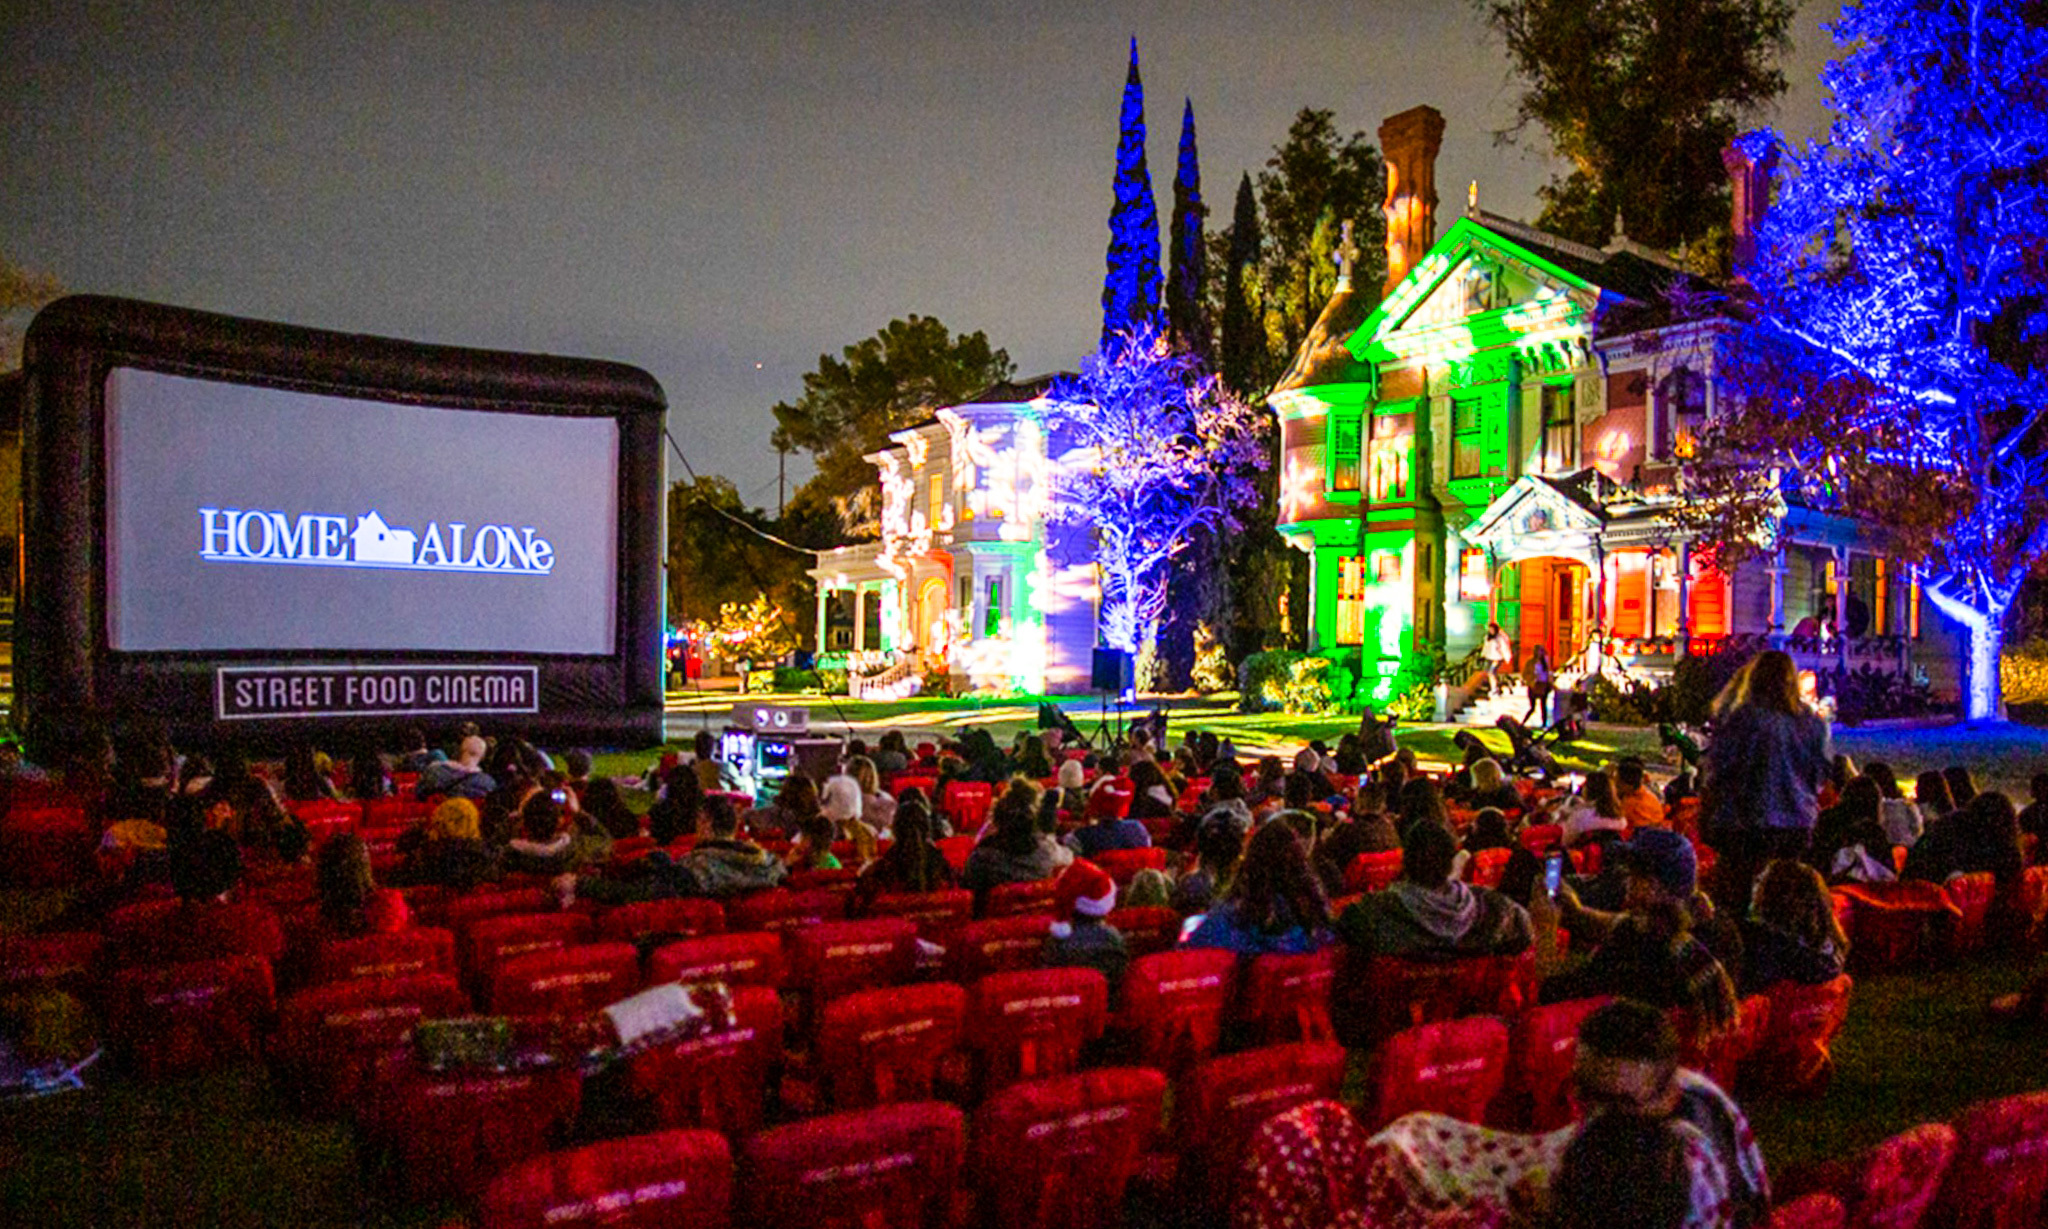 Yuletide Cinemaland from Street Food Cinema